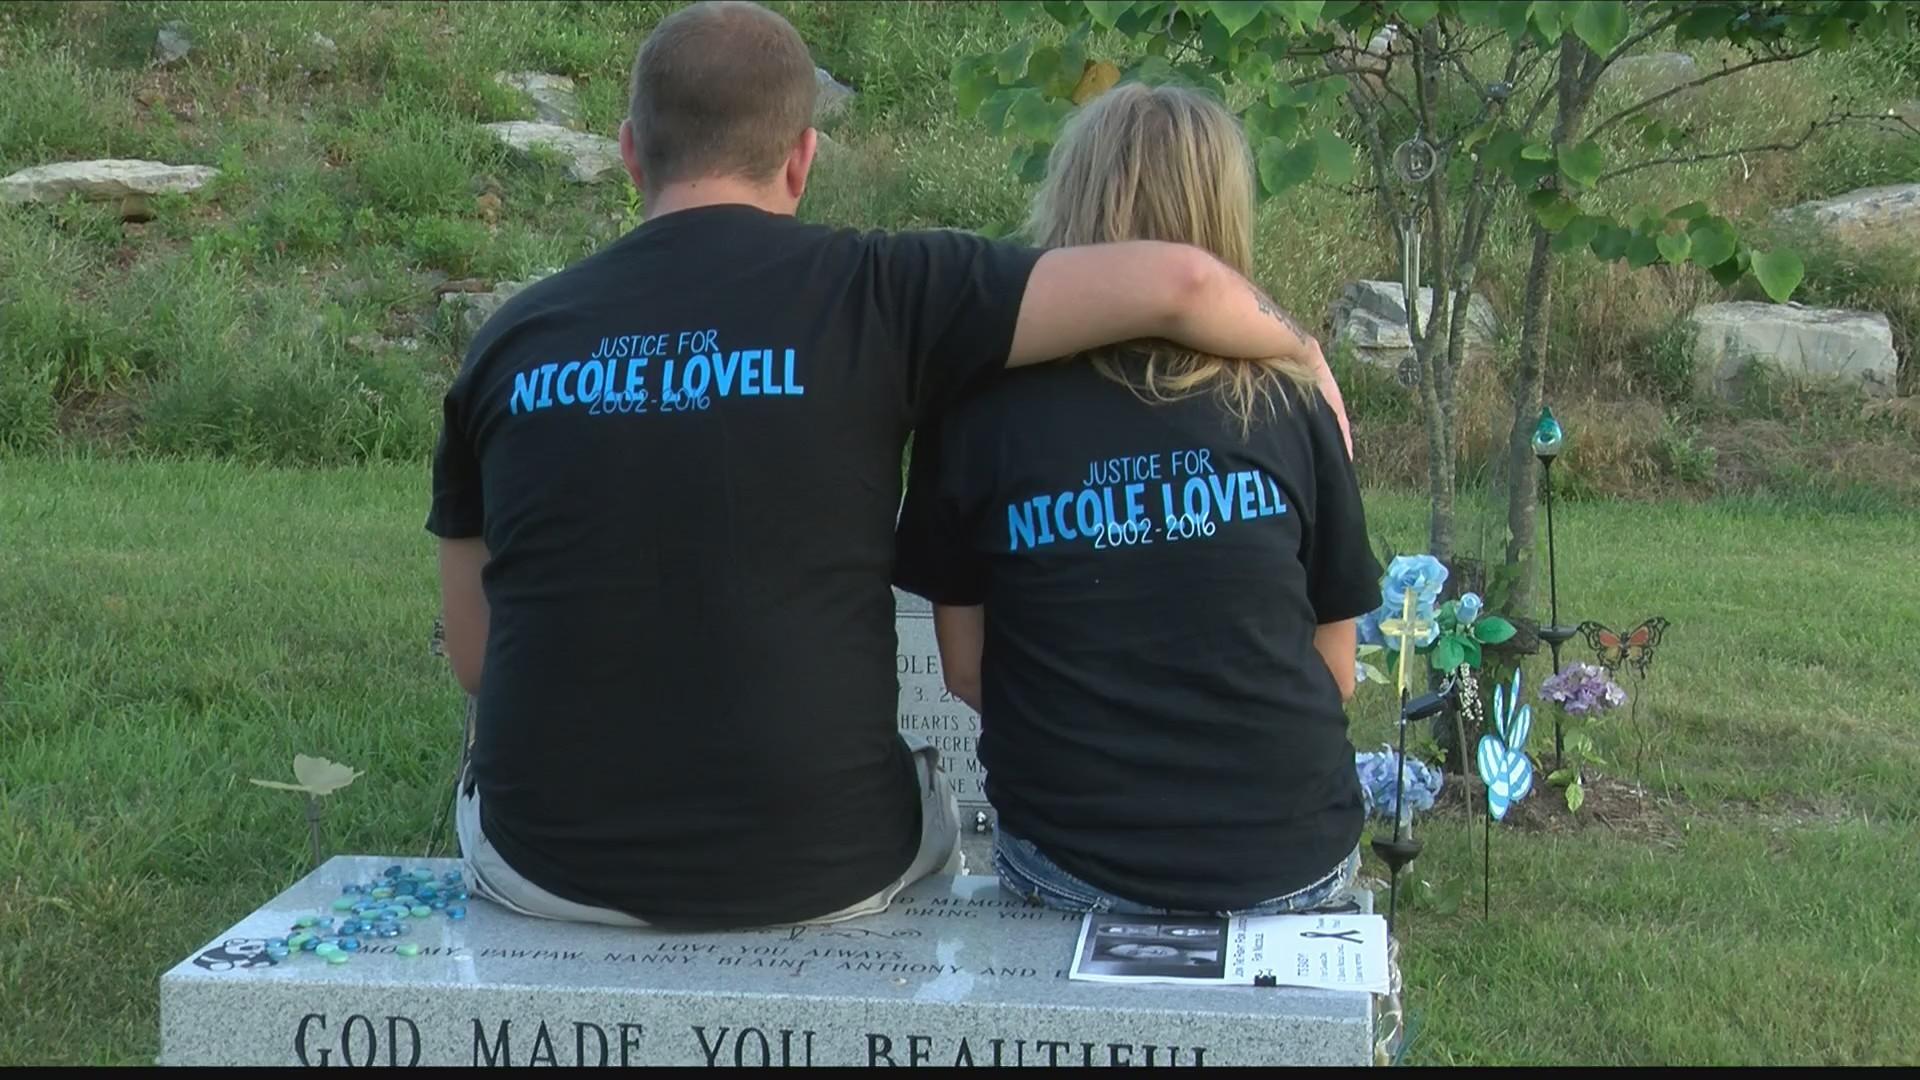 Nicole_Lovell_s_family_seeking_justice_0_20180718043242